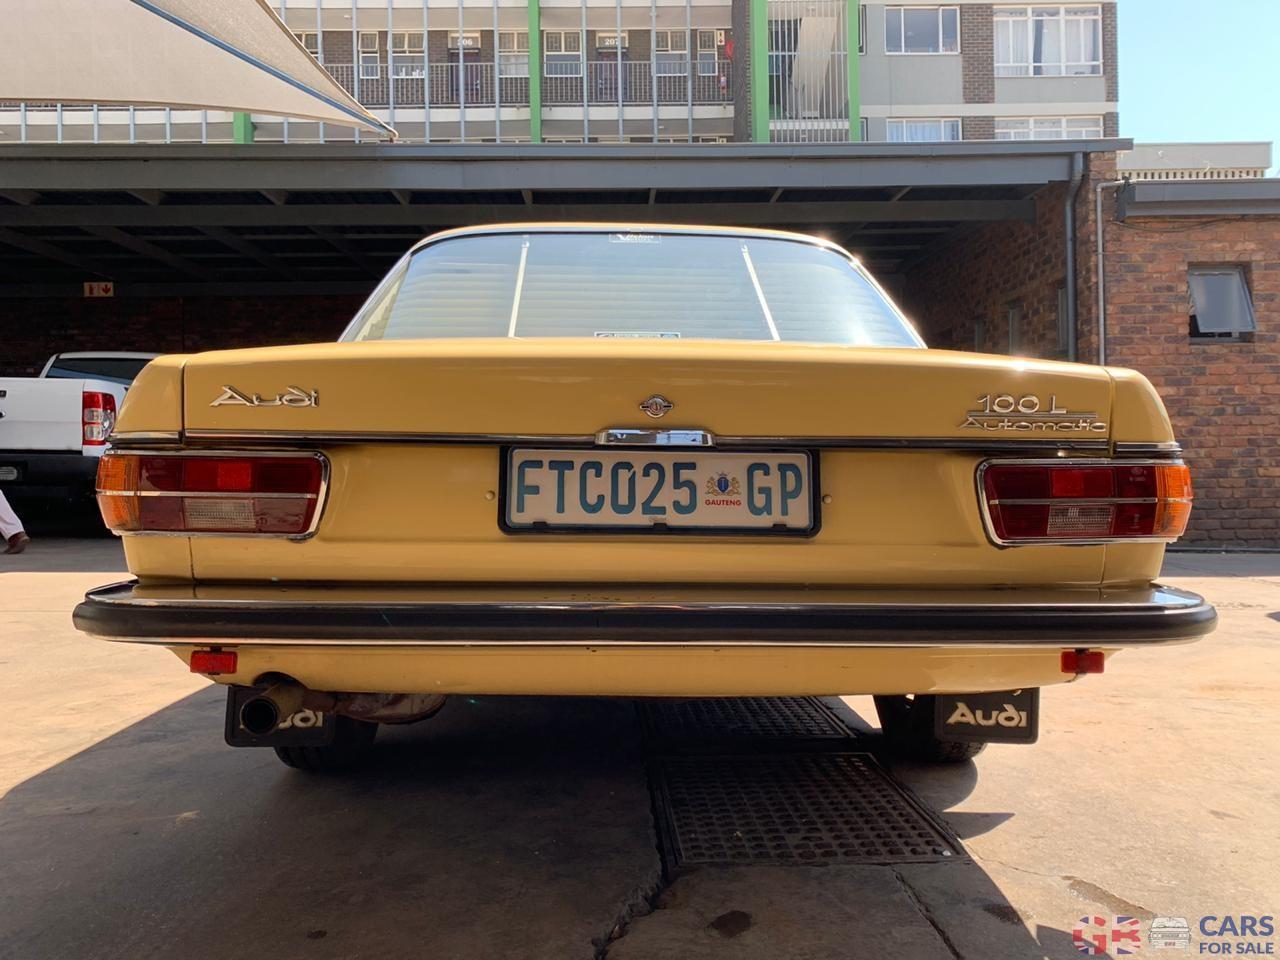 Audi 100 L 1976  rhdcarsforsale com gbca_43